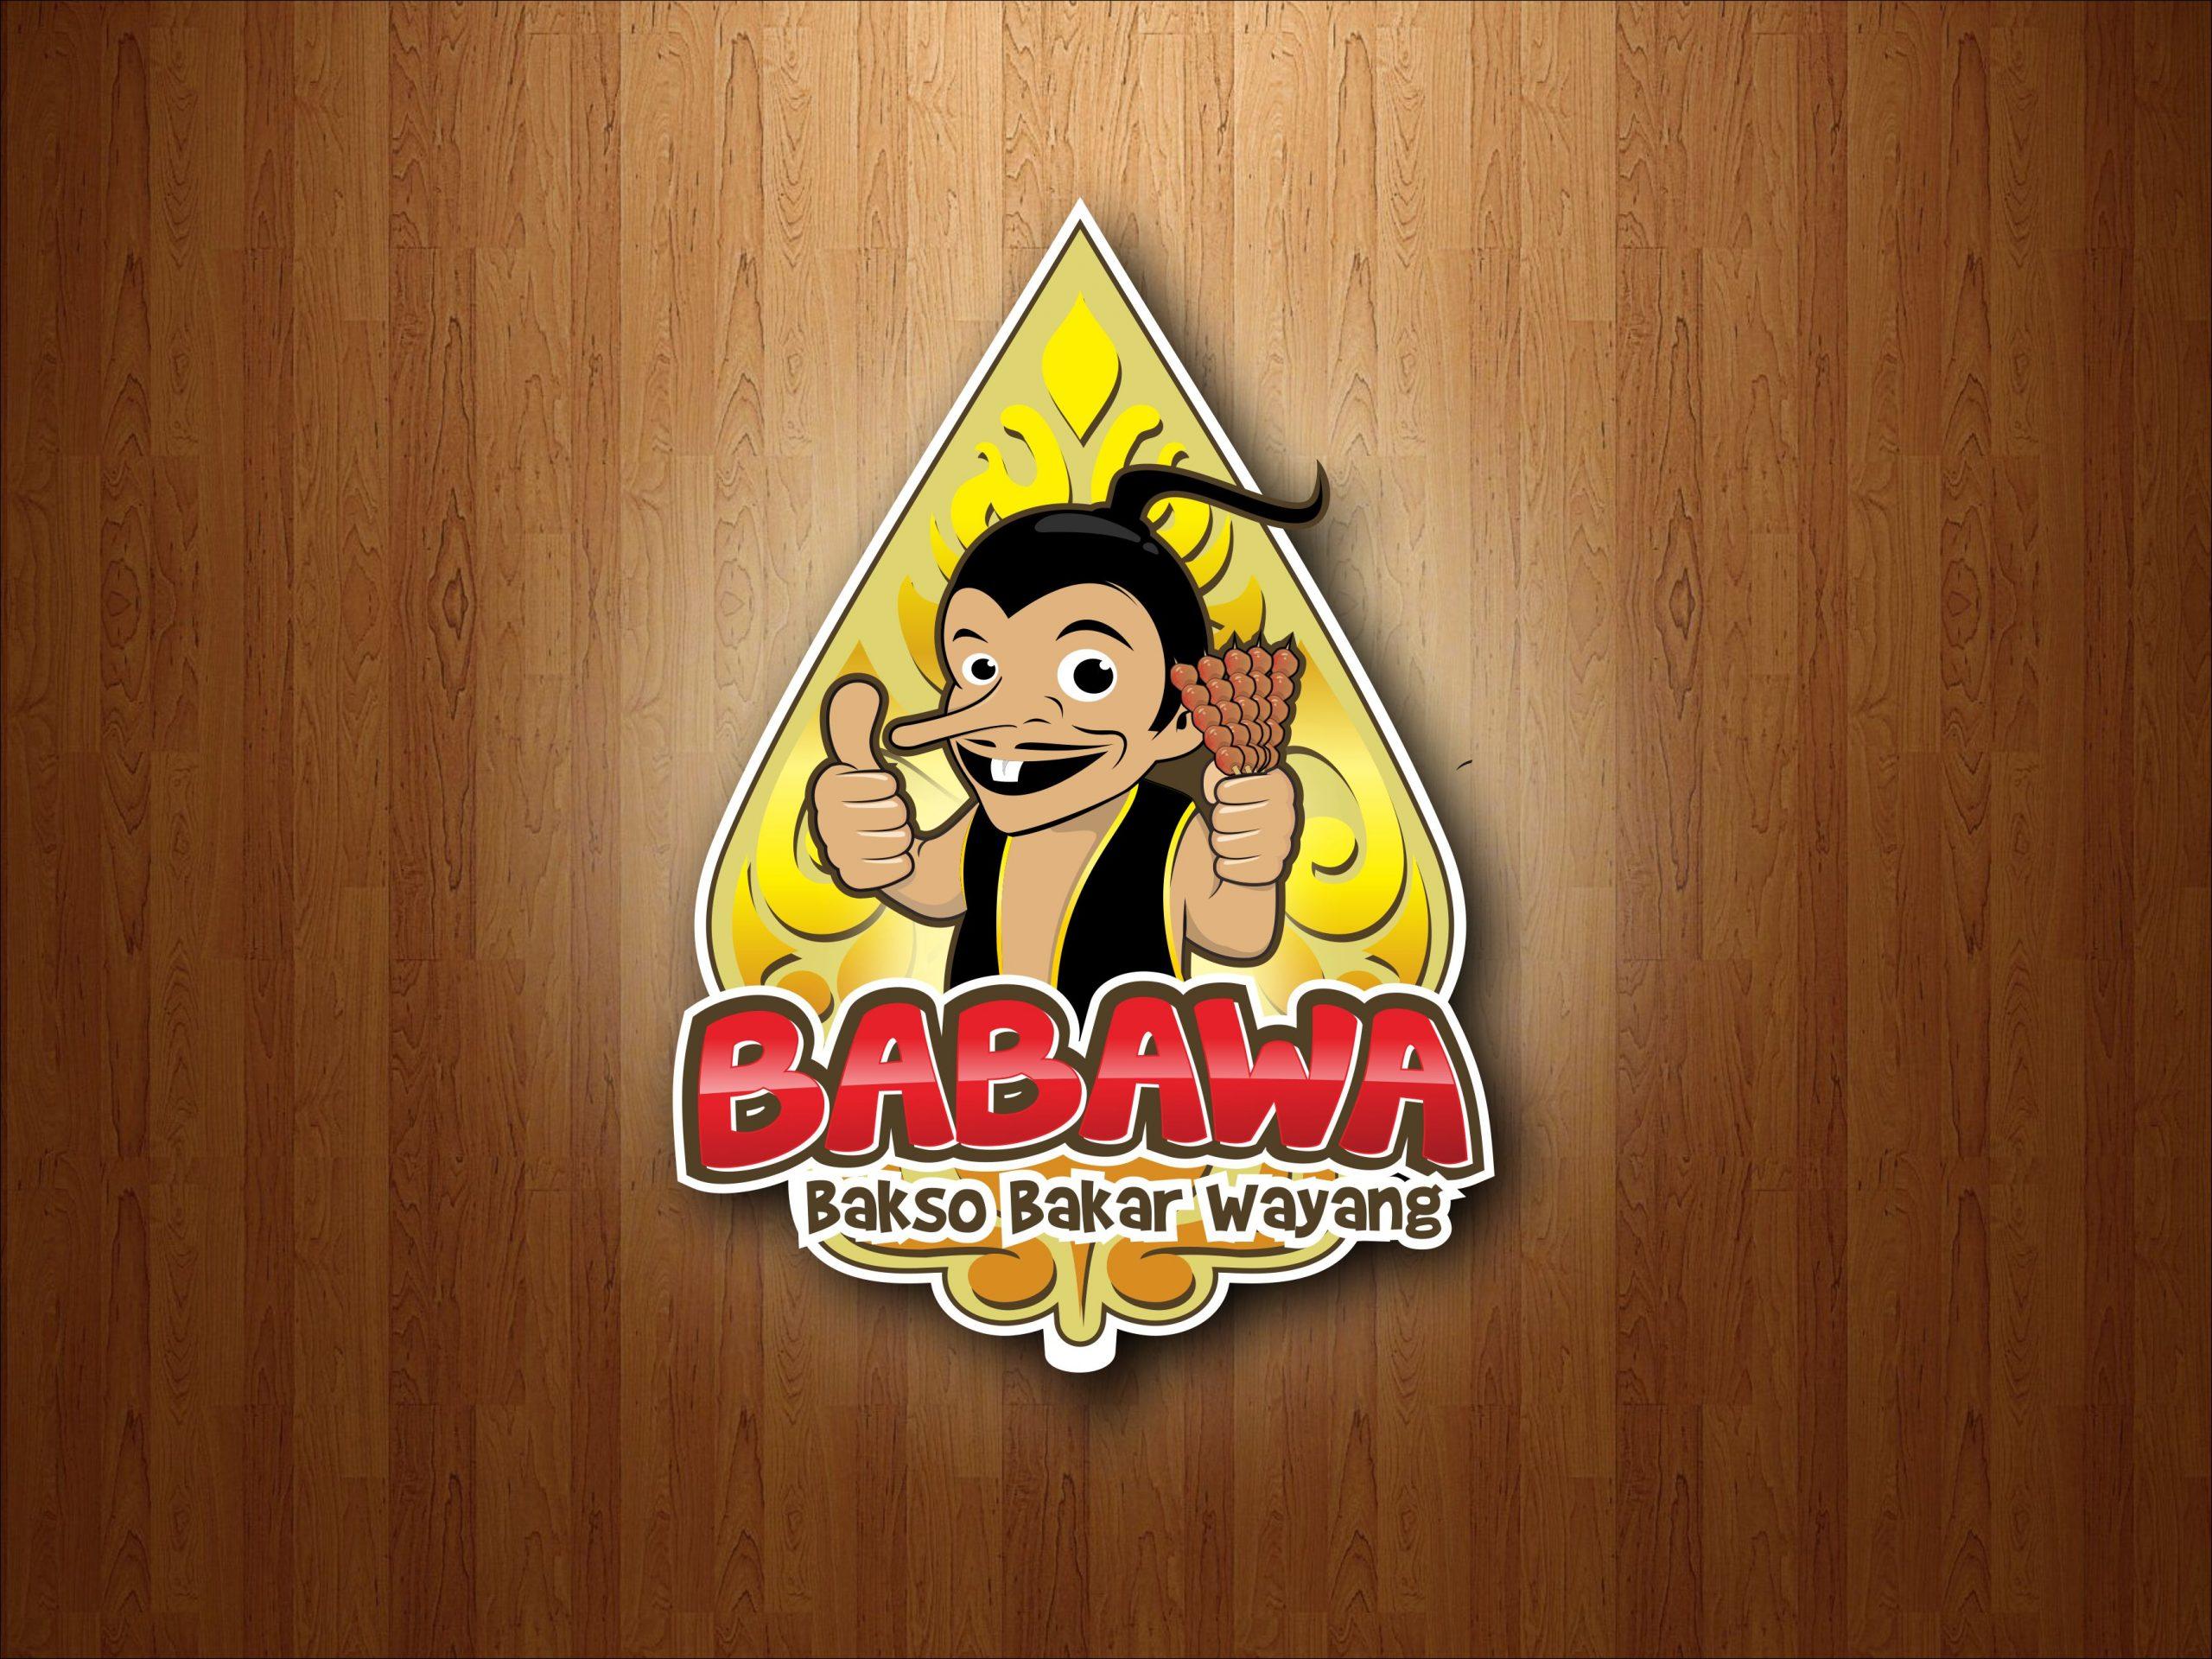 Maskot BABAWA